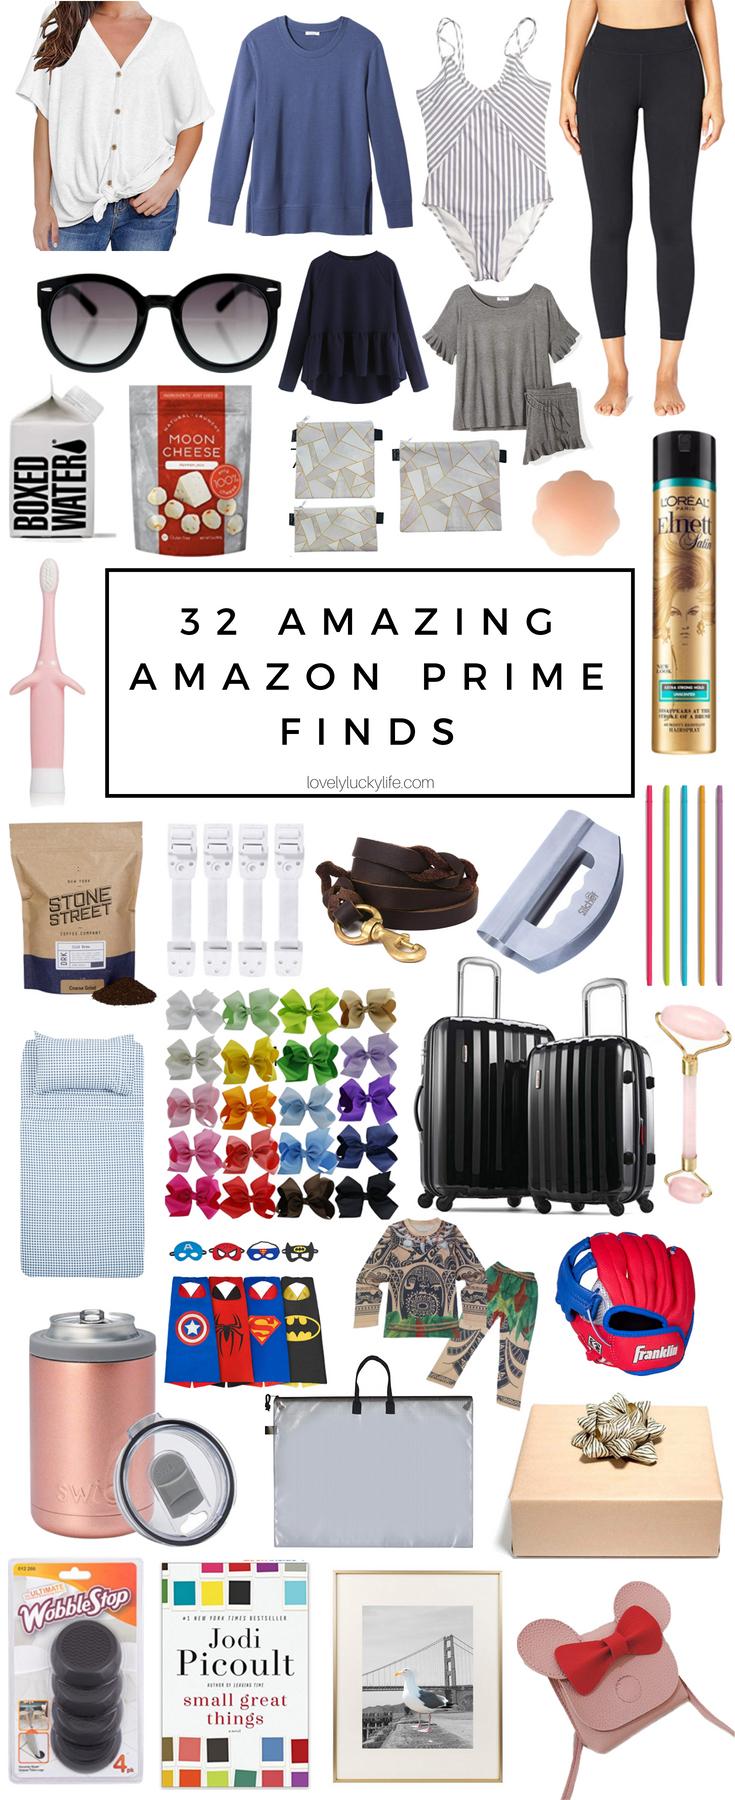 the best amazon prime stuff for families #prime #amazon